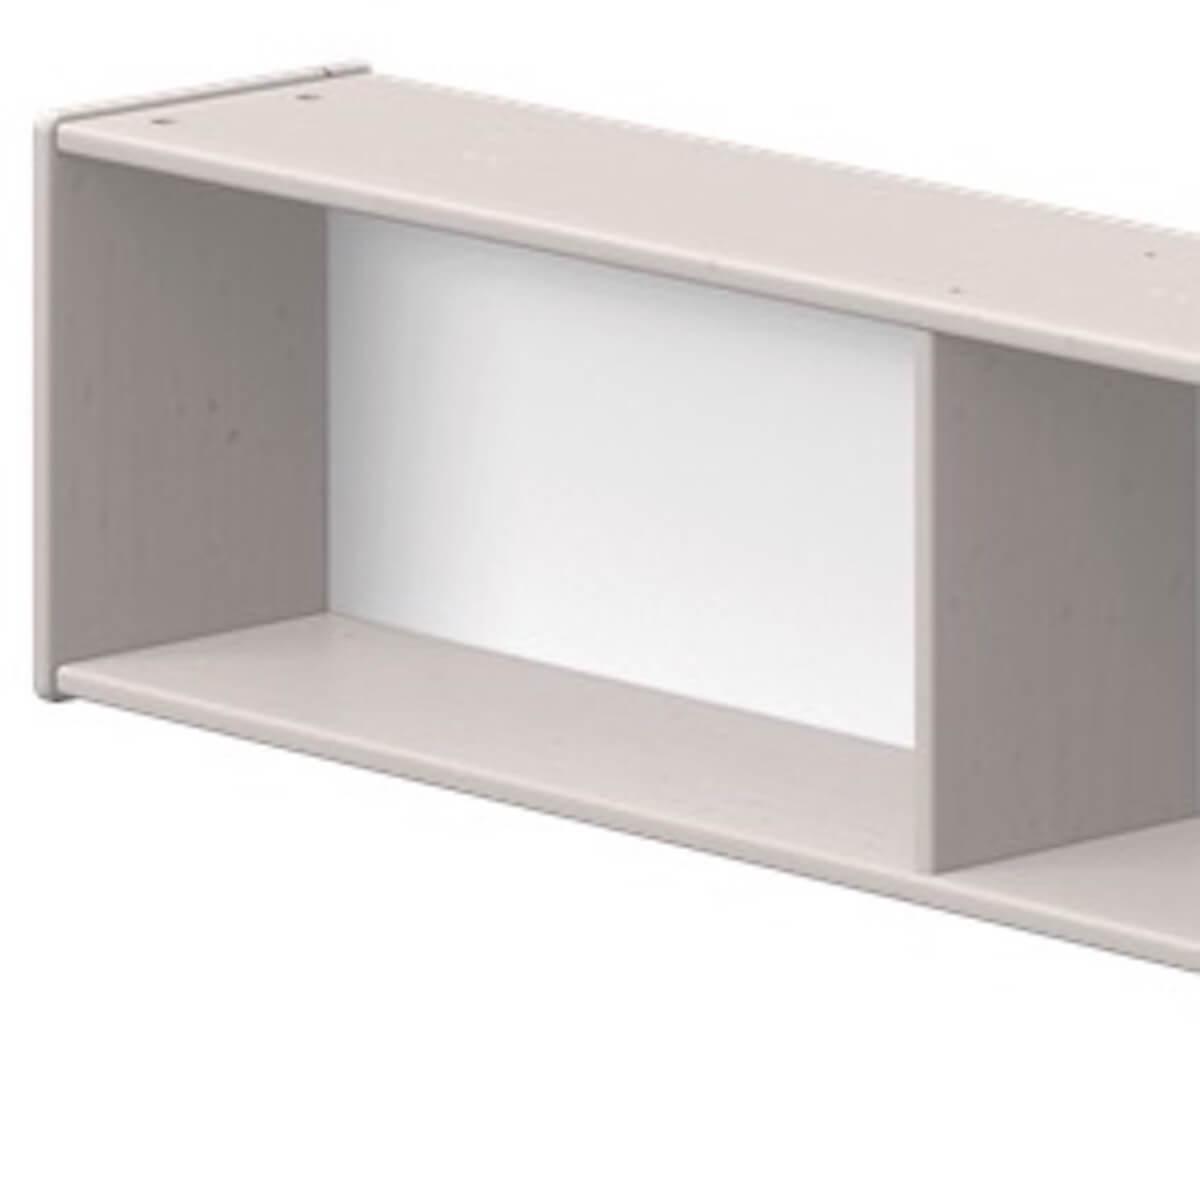 Estantería 3 compartimentos 200cm CLASSIC Flexa grey washed